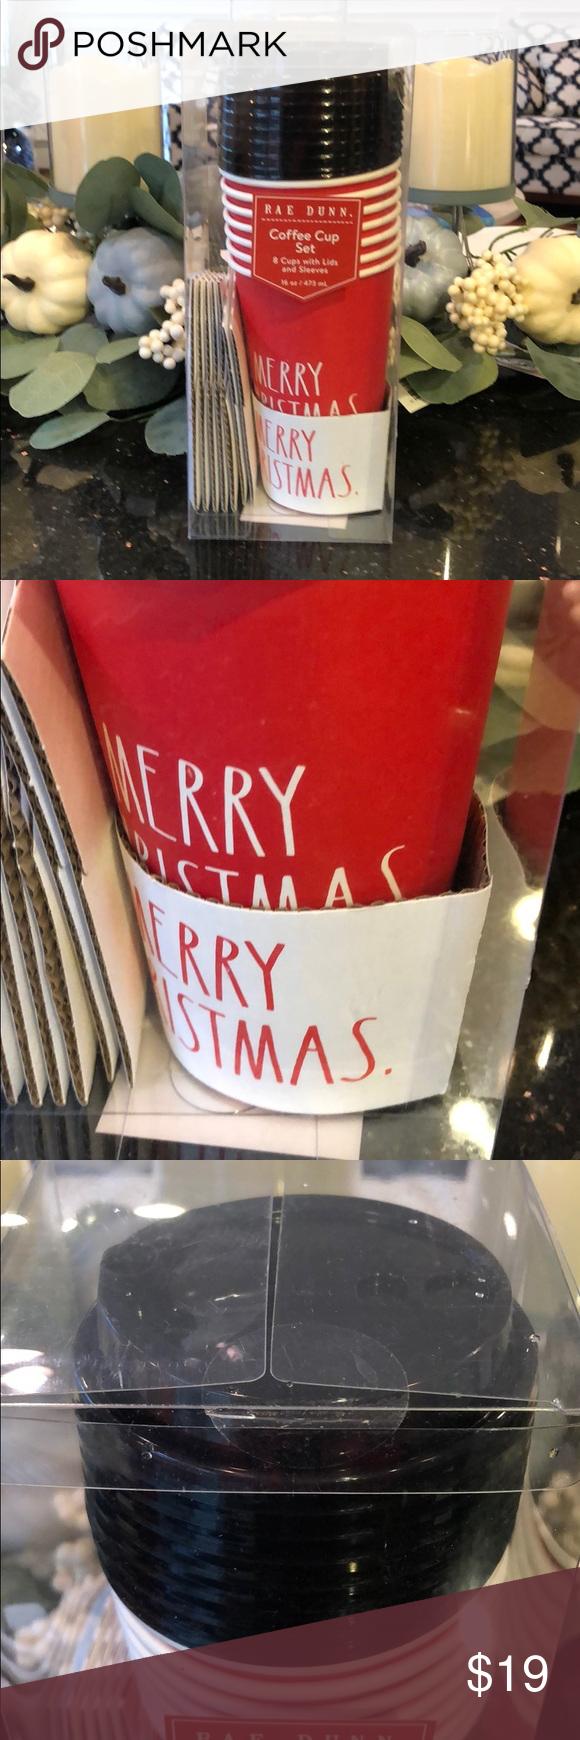 Rae Dunn coffee cup set MERRY CHRISTMAS 16 oz NWT Coffee